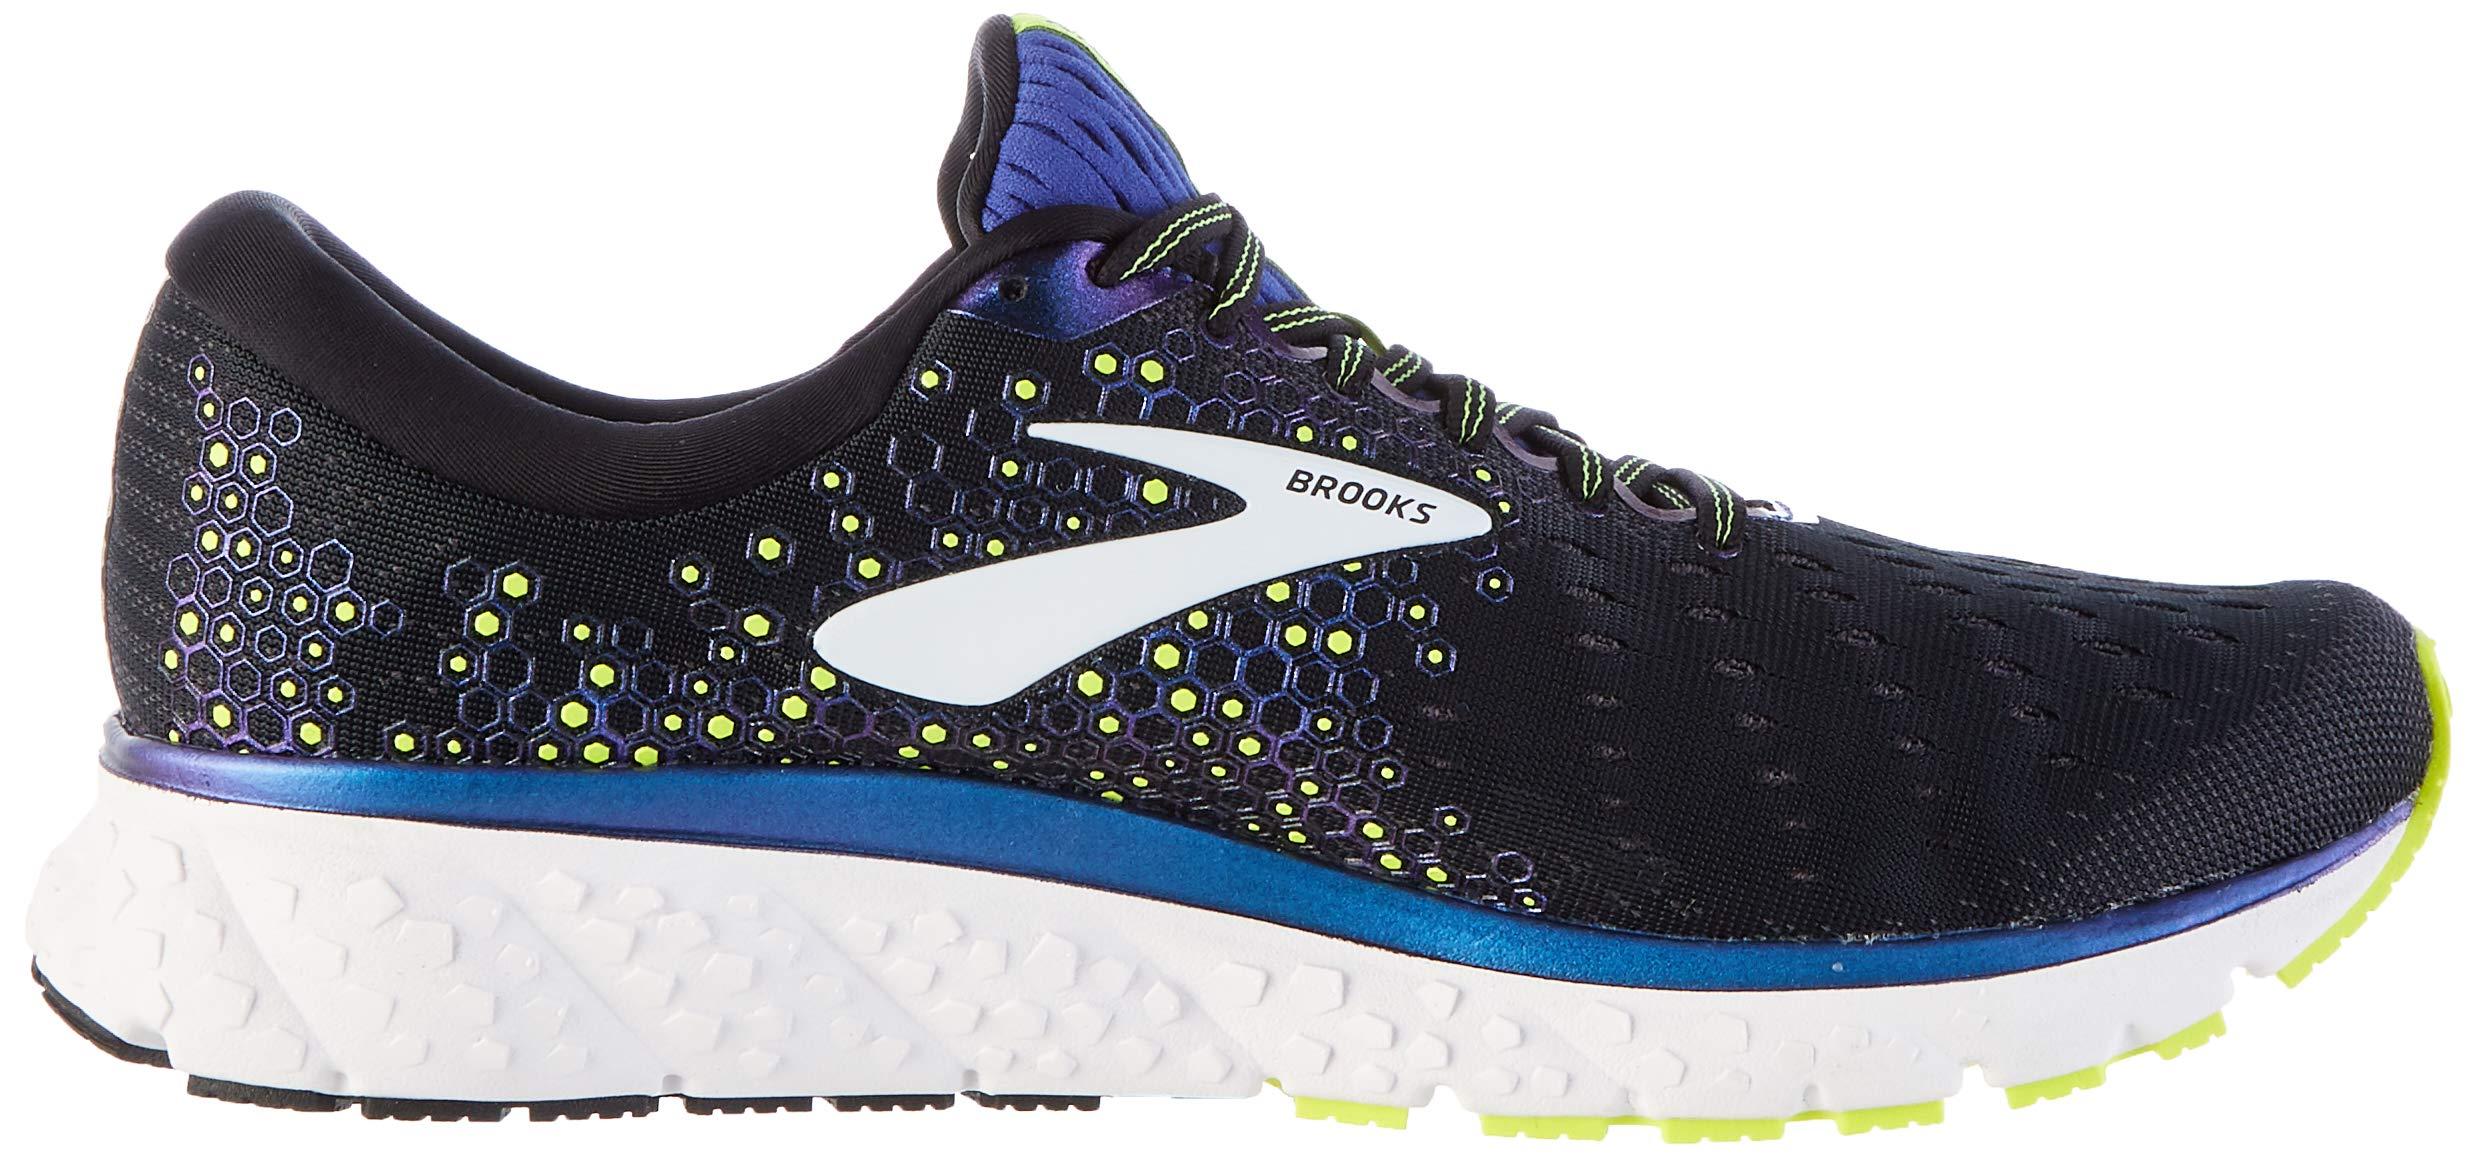 81EEfydoJyL - Brooks Men's Glycerin 17 Running Shoes